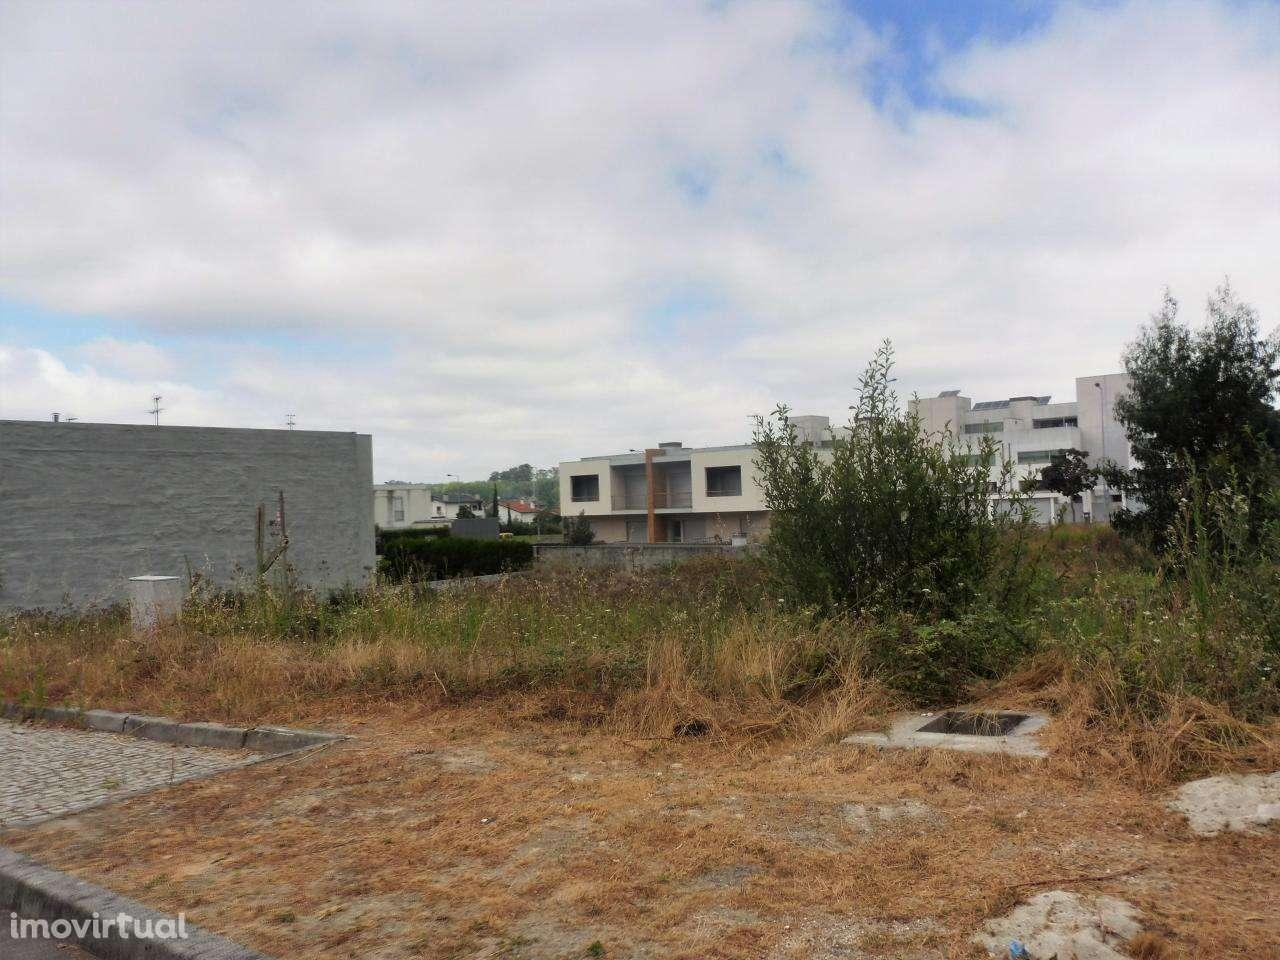 Terreno para comprar, Castêlo da Maia, Maia, Porto - Foto 3